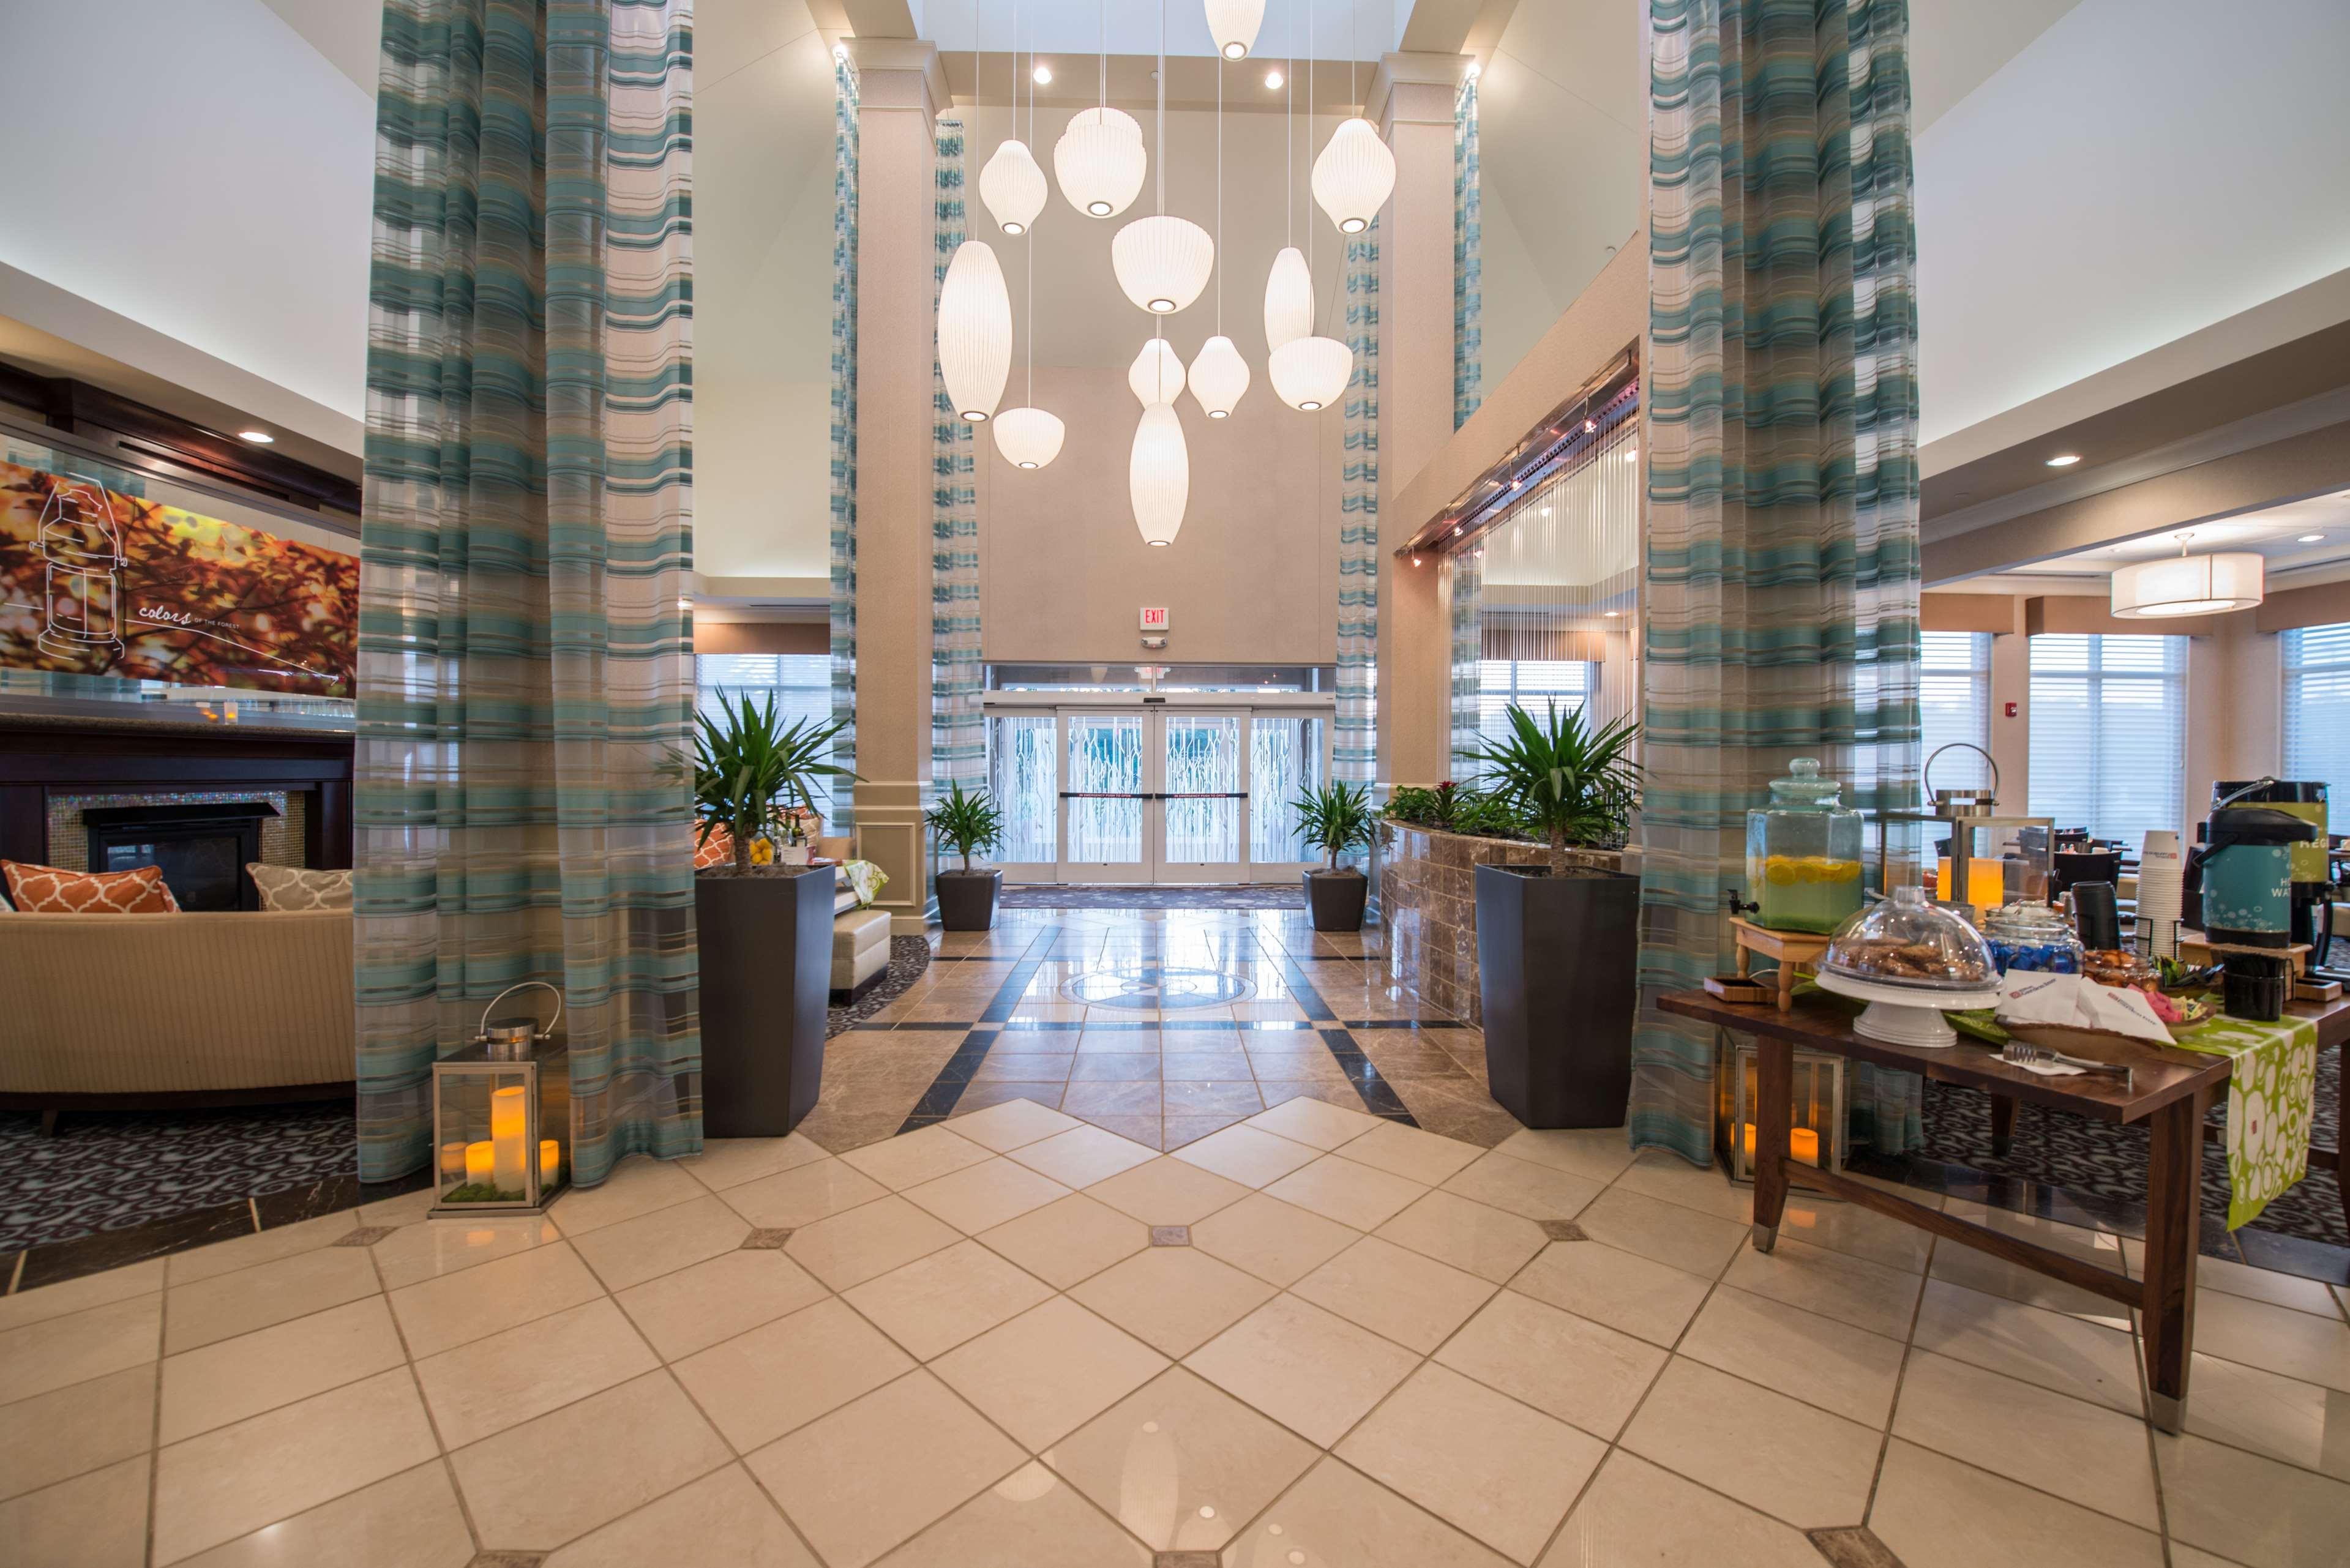 Hilton Garden Inn Lynchburg image 6